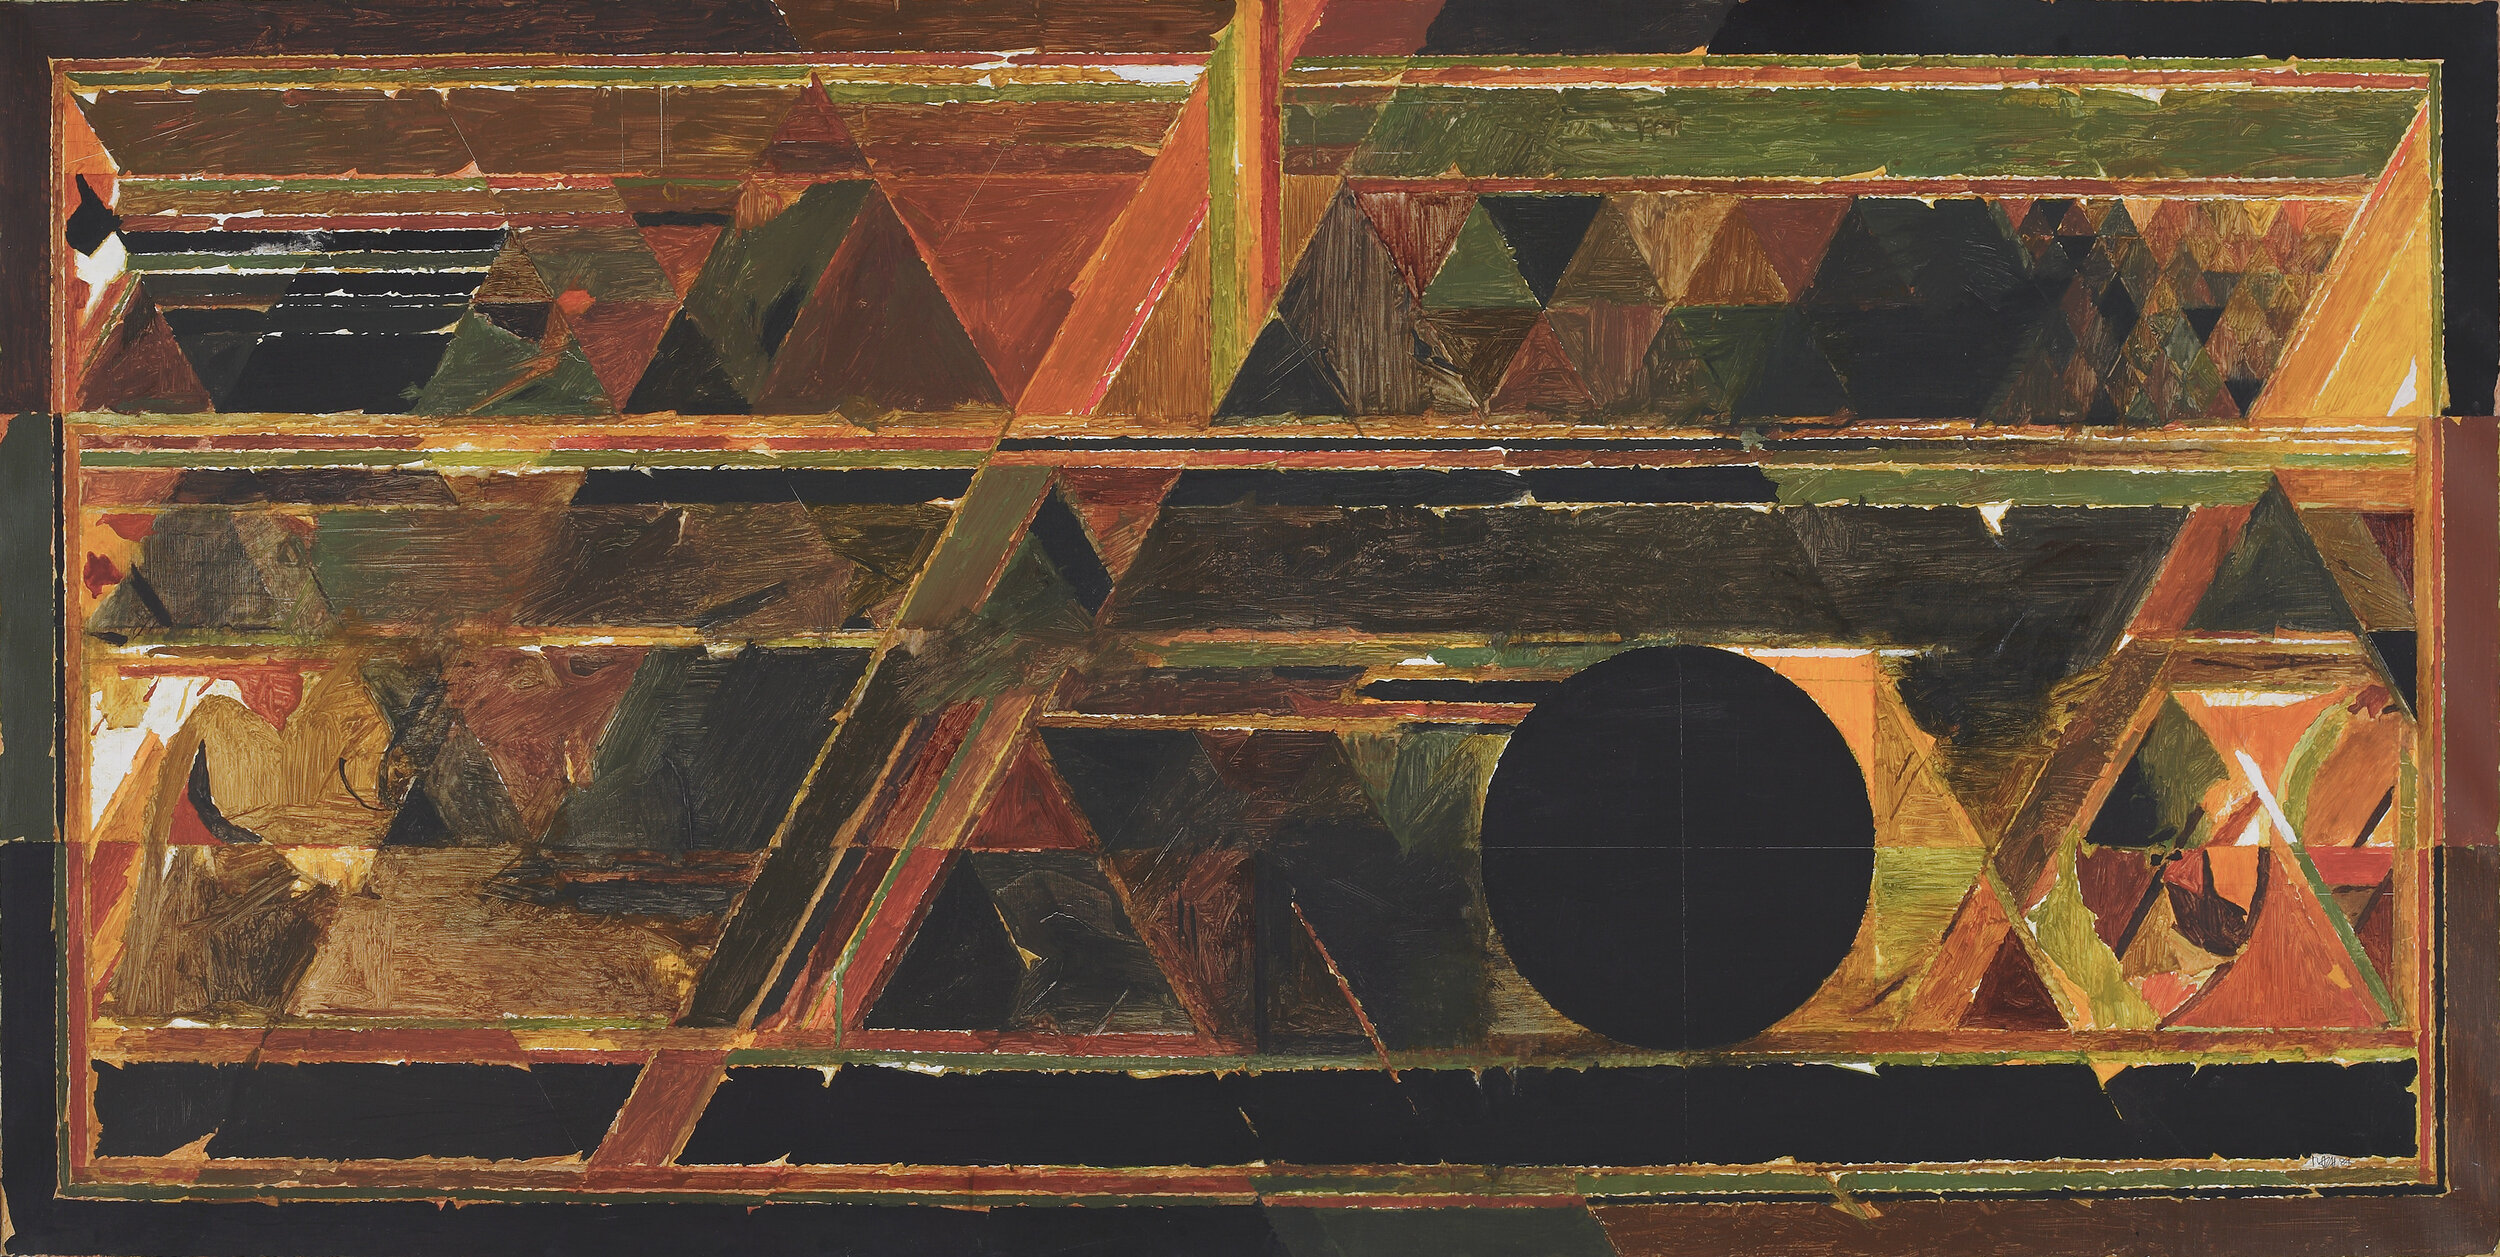 S. H. Raza  Satpura , 1984, Acrylic on canvas H. 47 x W. 94 in. (119.4 x 238.8 cm), Minal and Dinesh Vazirani, Image courtesy of the Lender